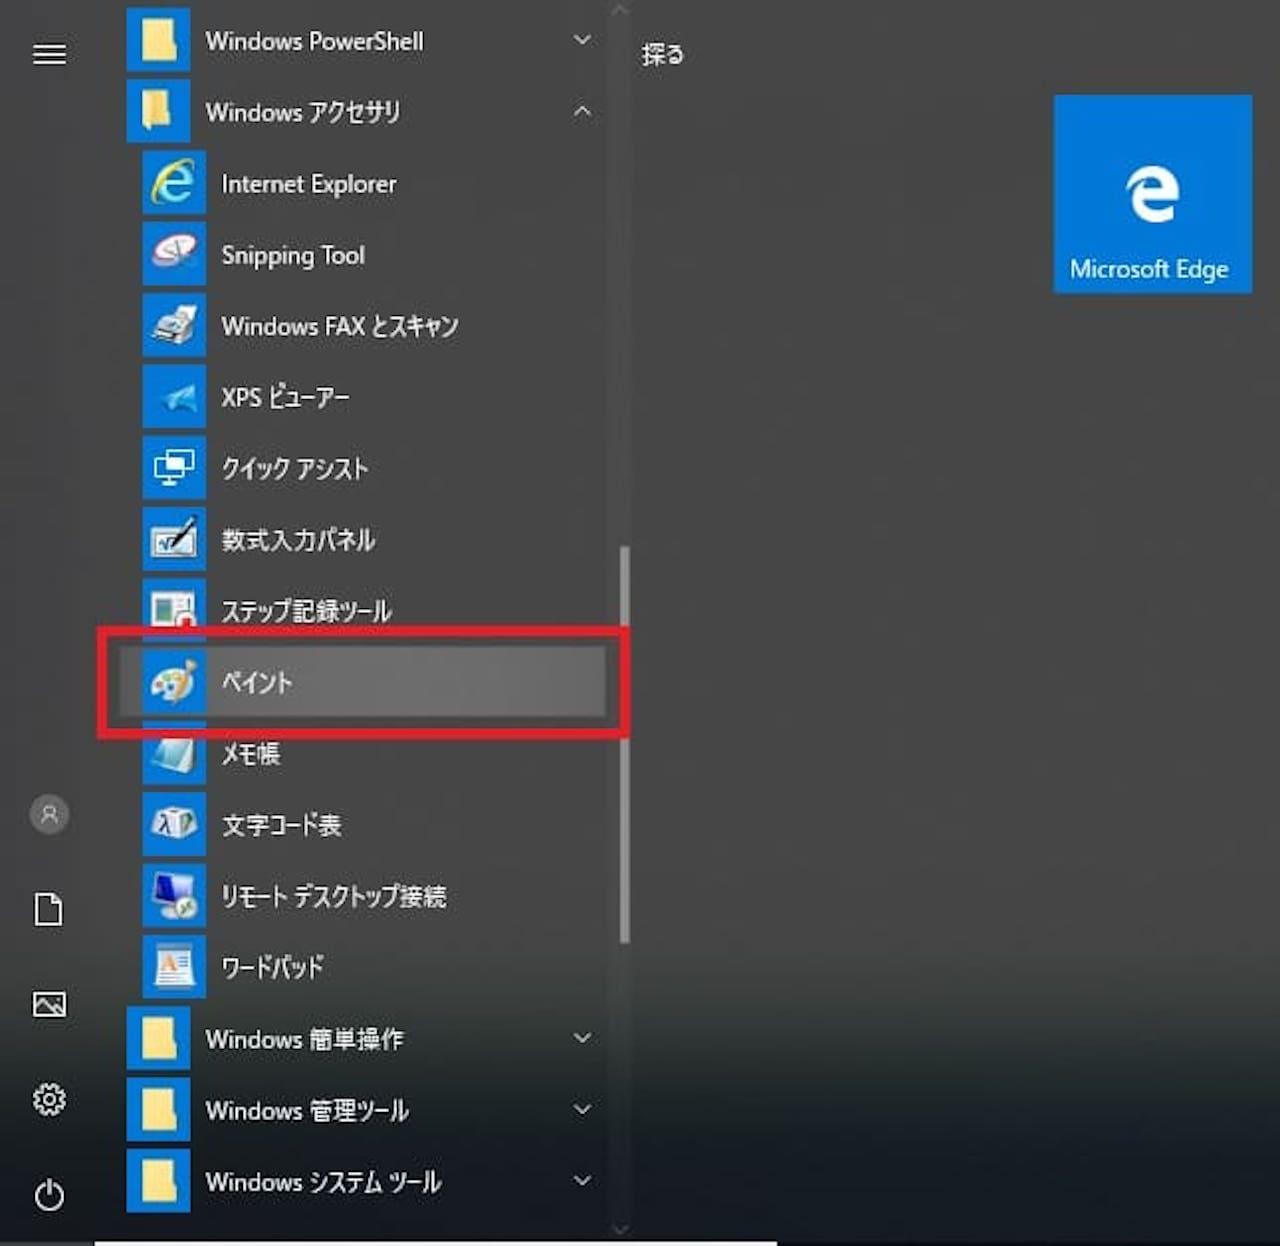 Windows10で撮ったスクリーンショットを画像として保存する方法③